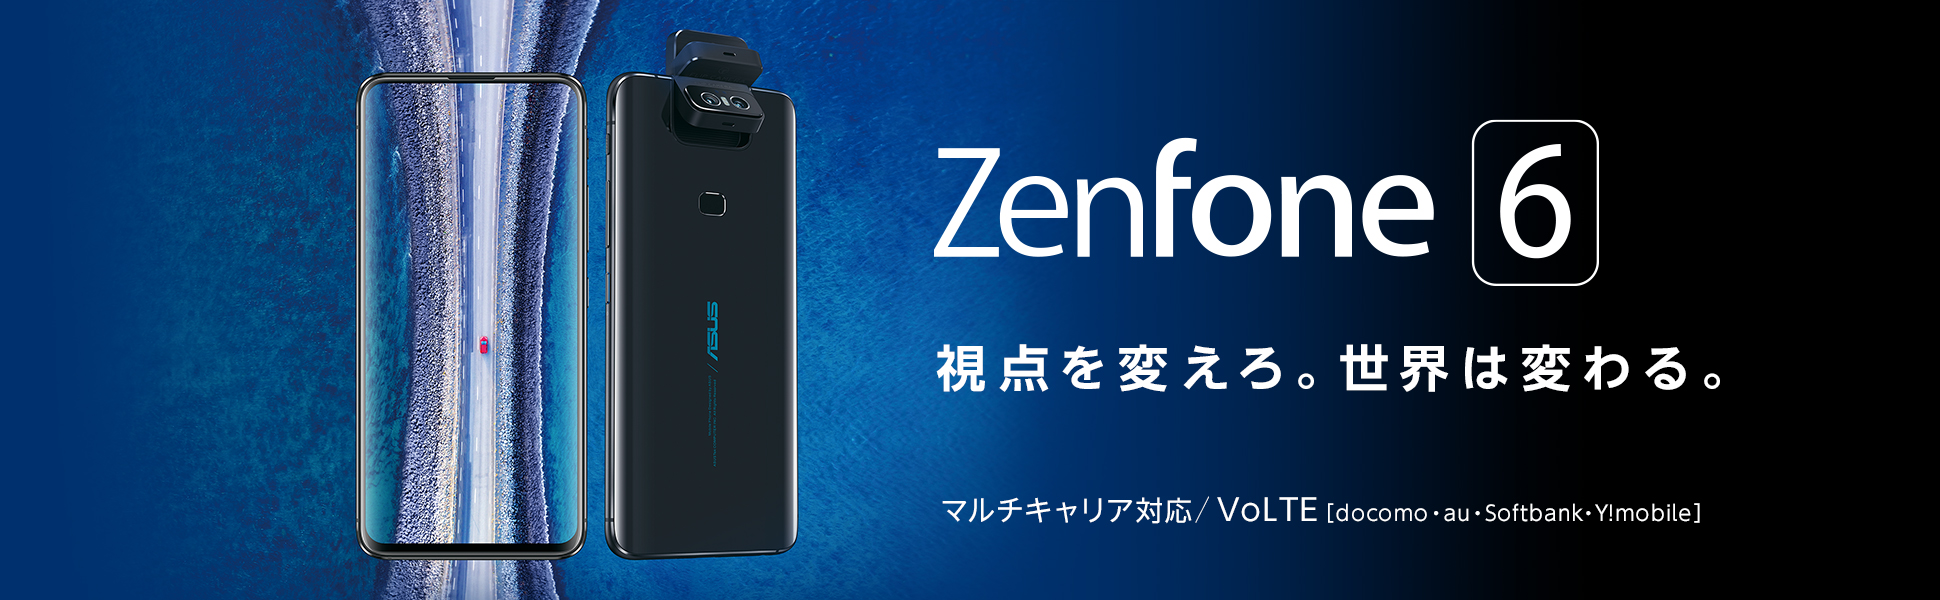 ZenFone 6 01